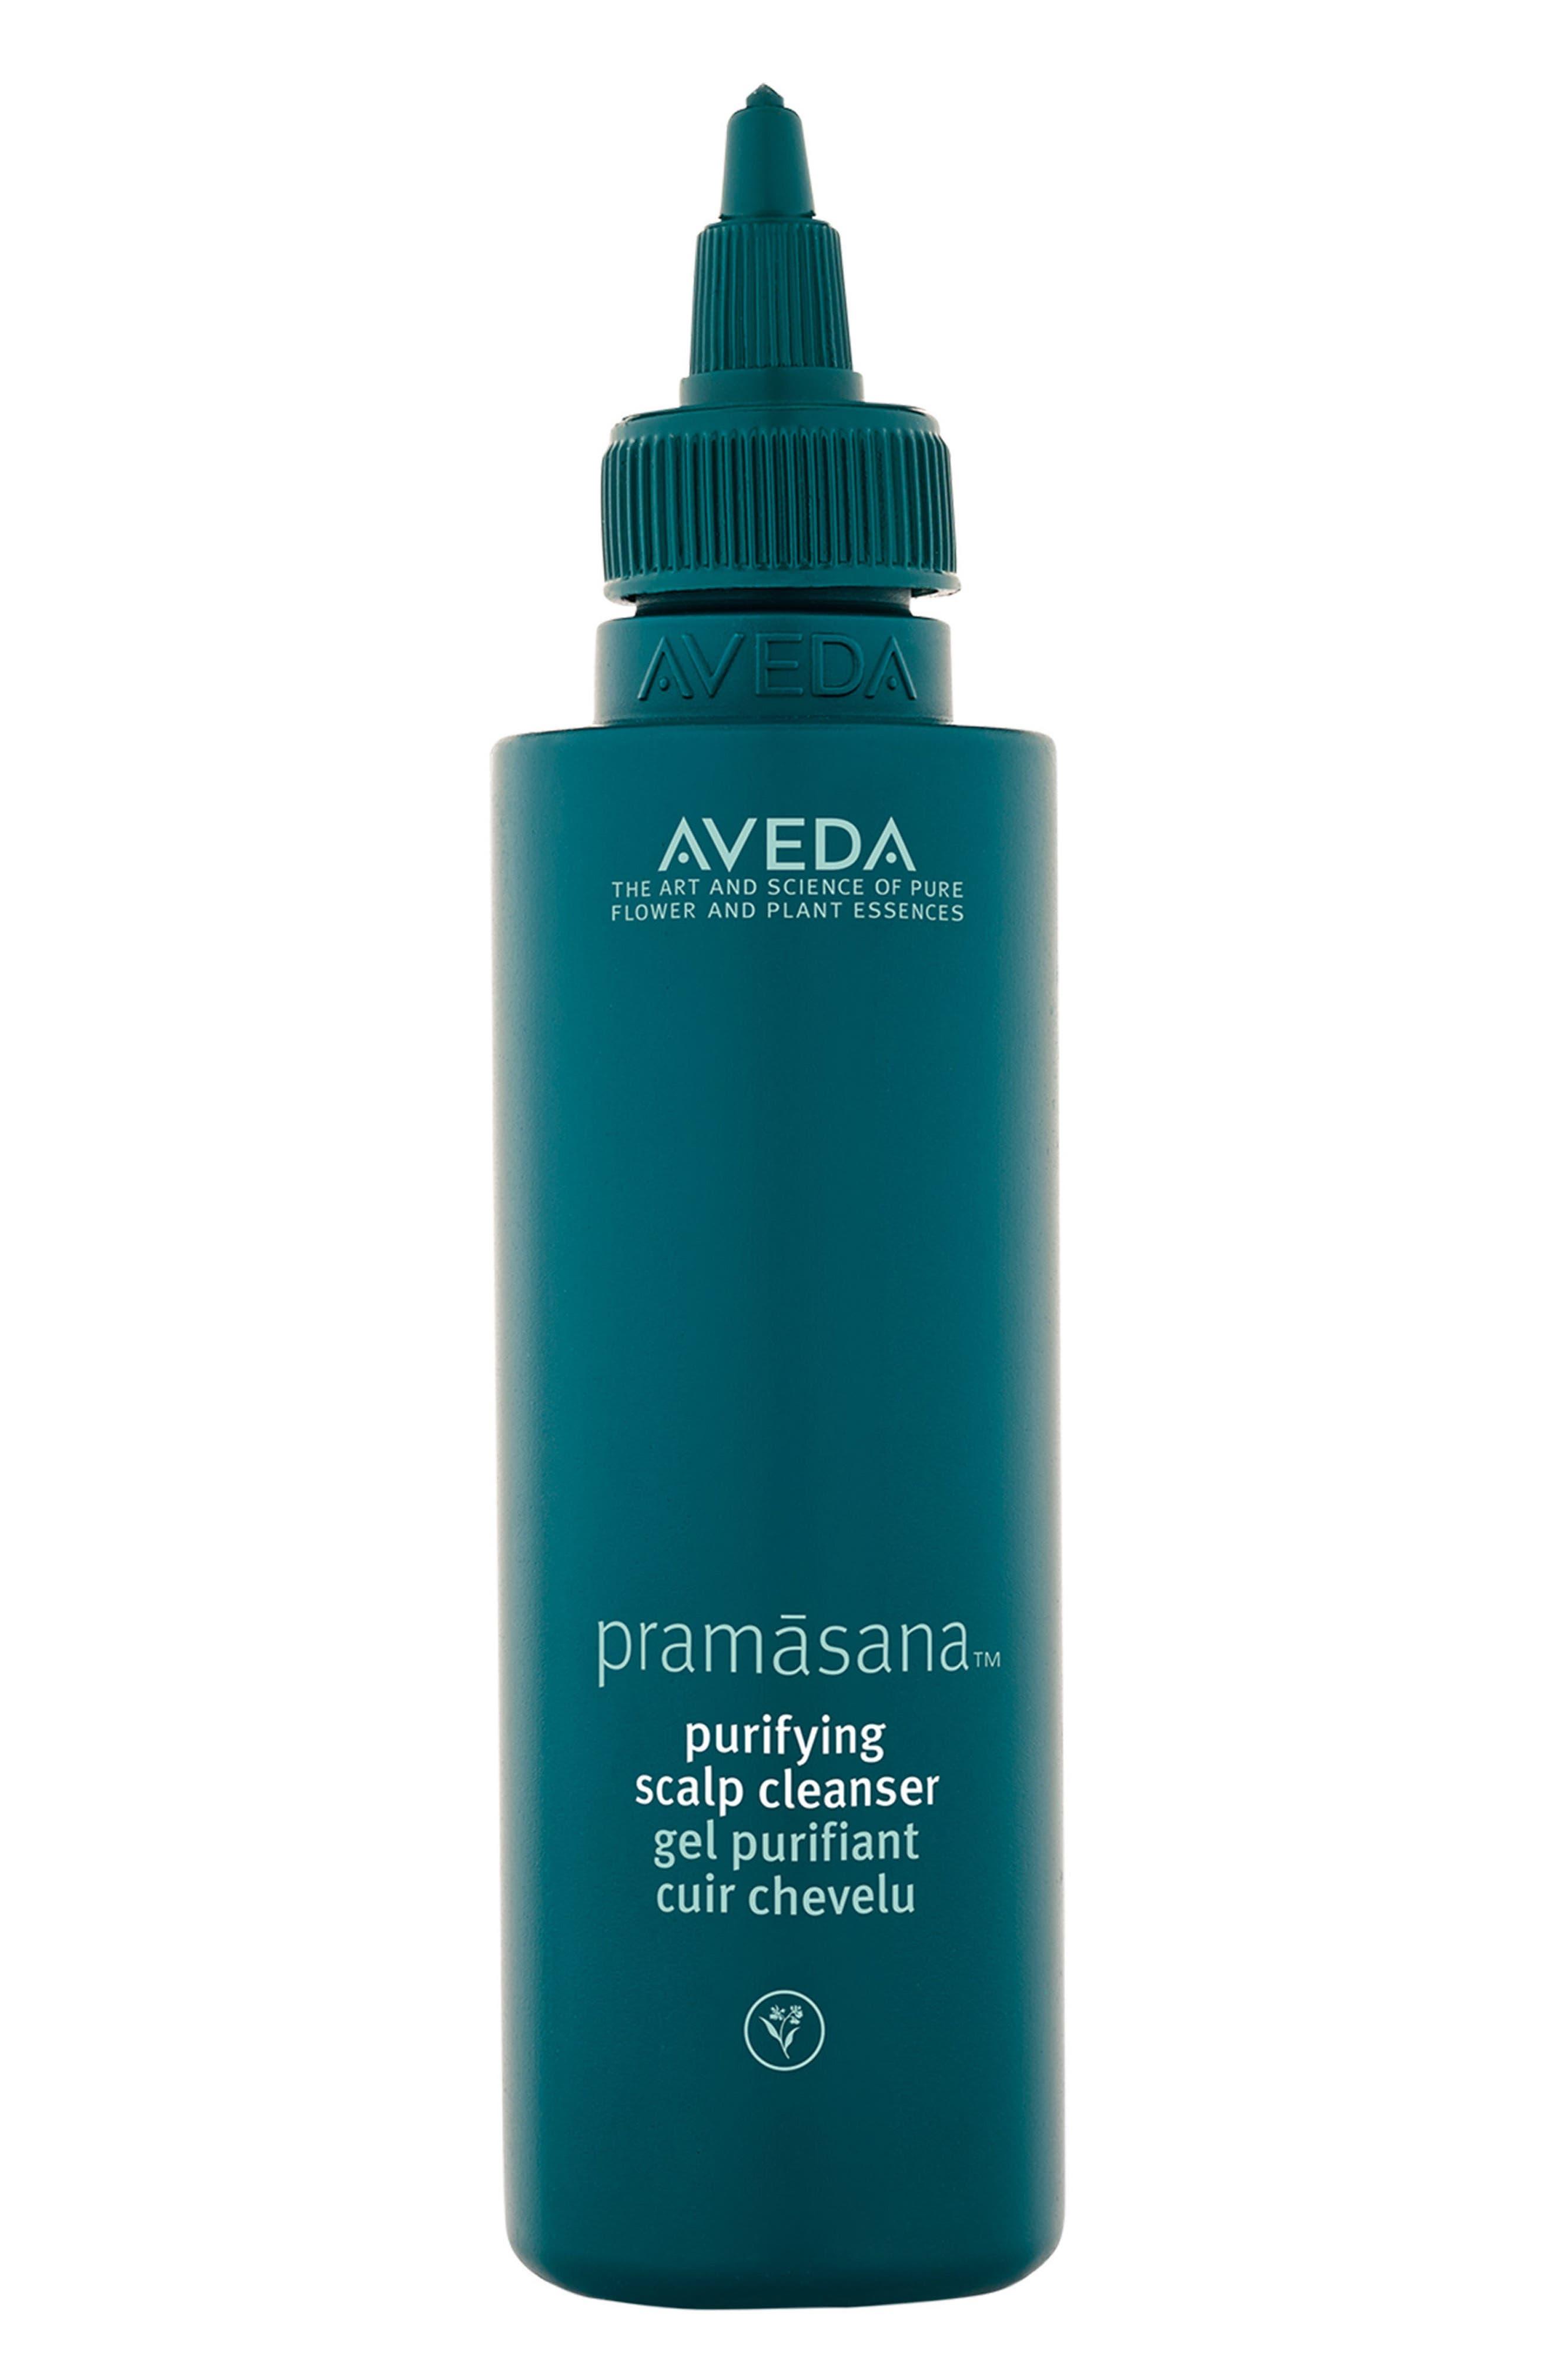 Aveda pramasana™ Purifying Scalp Cleanser